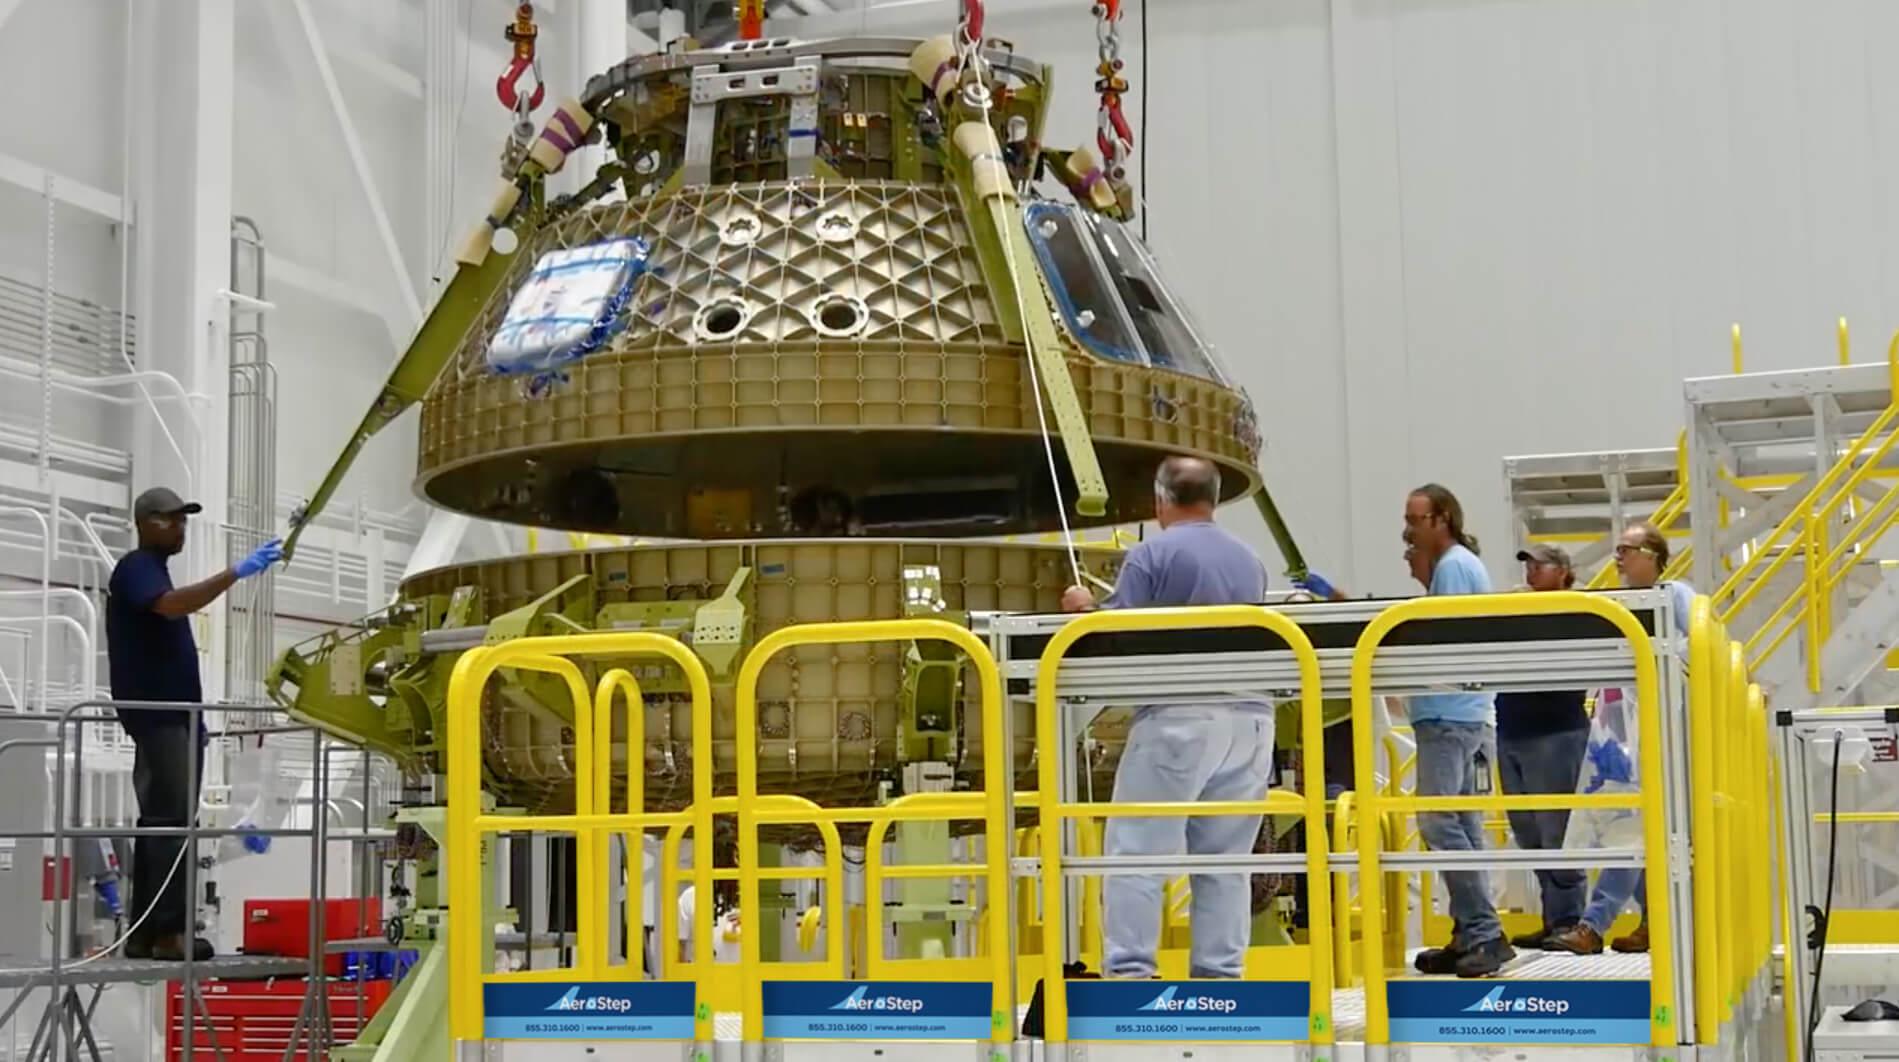 Metal Work Platform with Railing for NASA Space Capsule